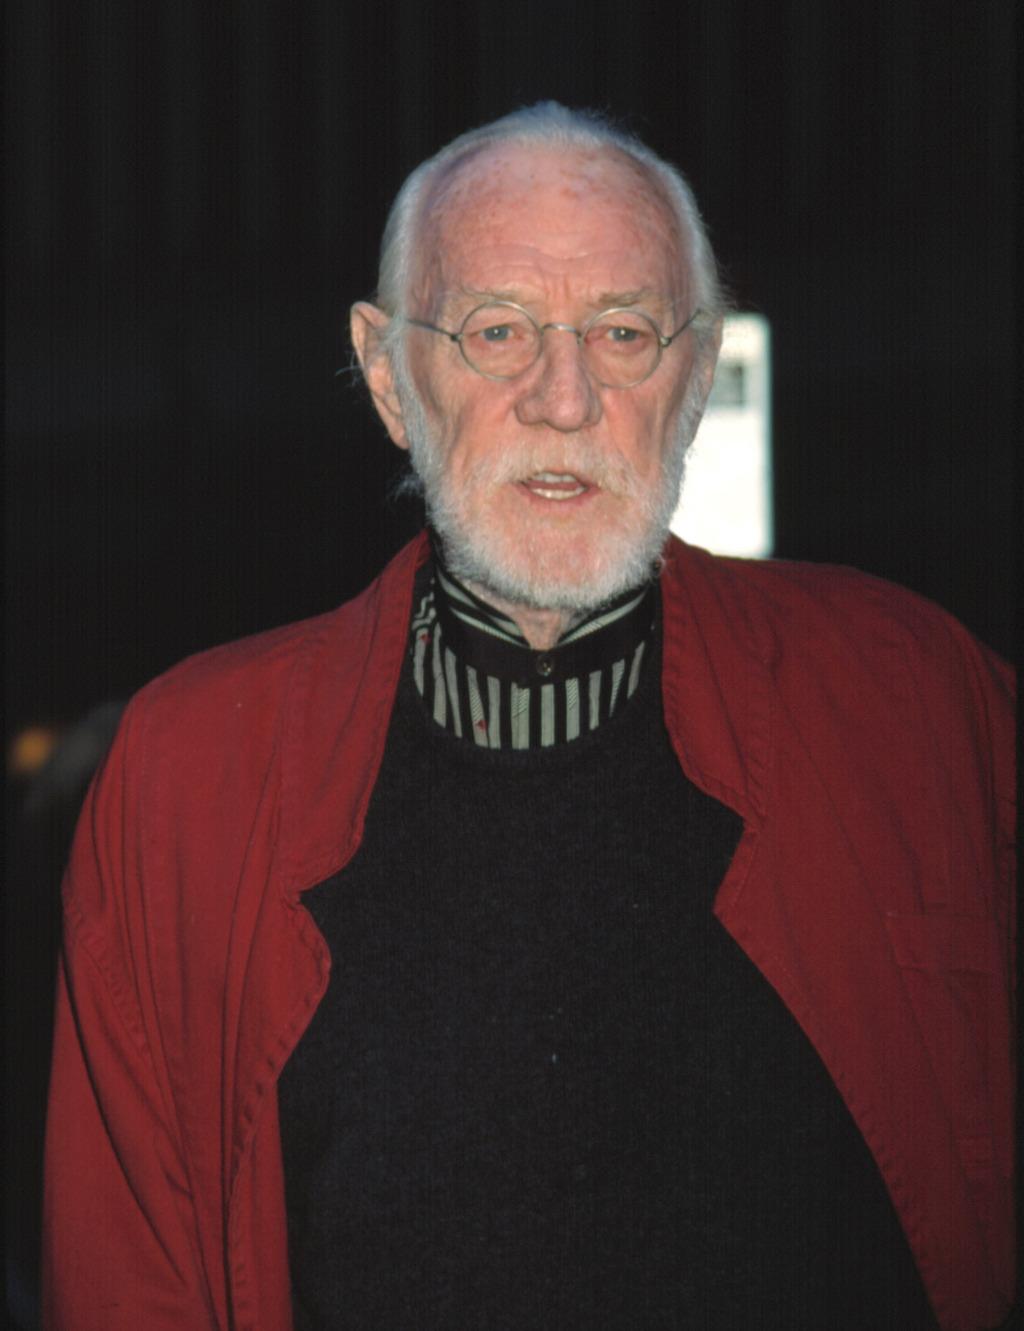 Richard harris actor